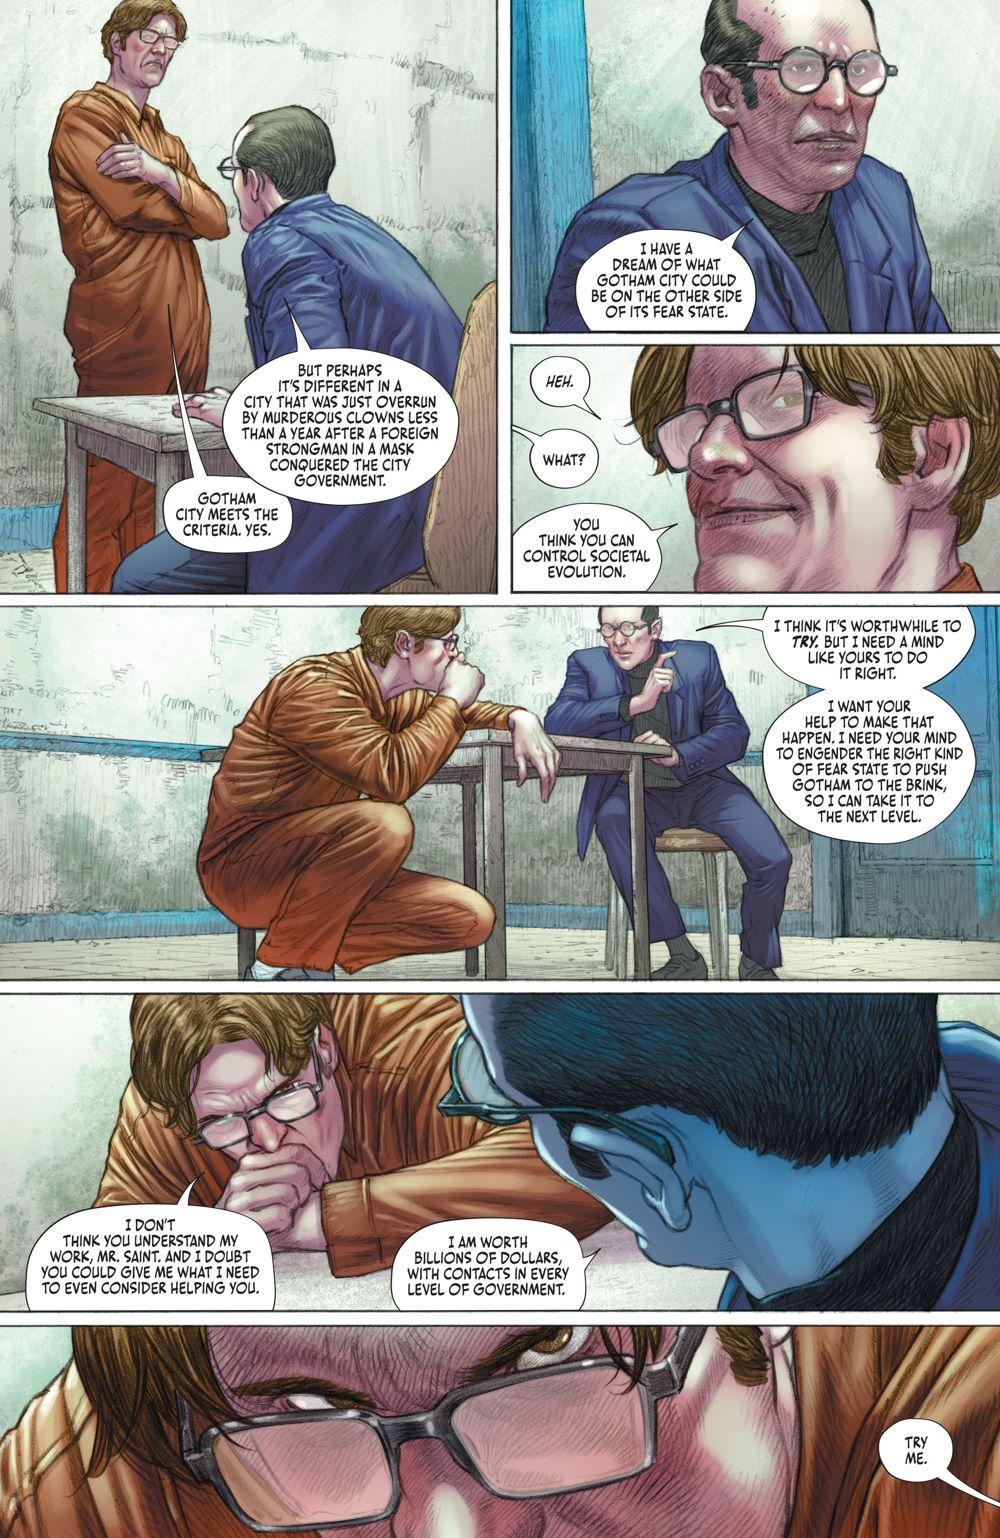 Batman-Fear-State-Alpha-1-7_612852e71ba991.01118524 ComicList Previews: BATMAN FEAR STATE ALPHA #1